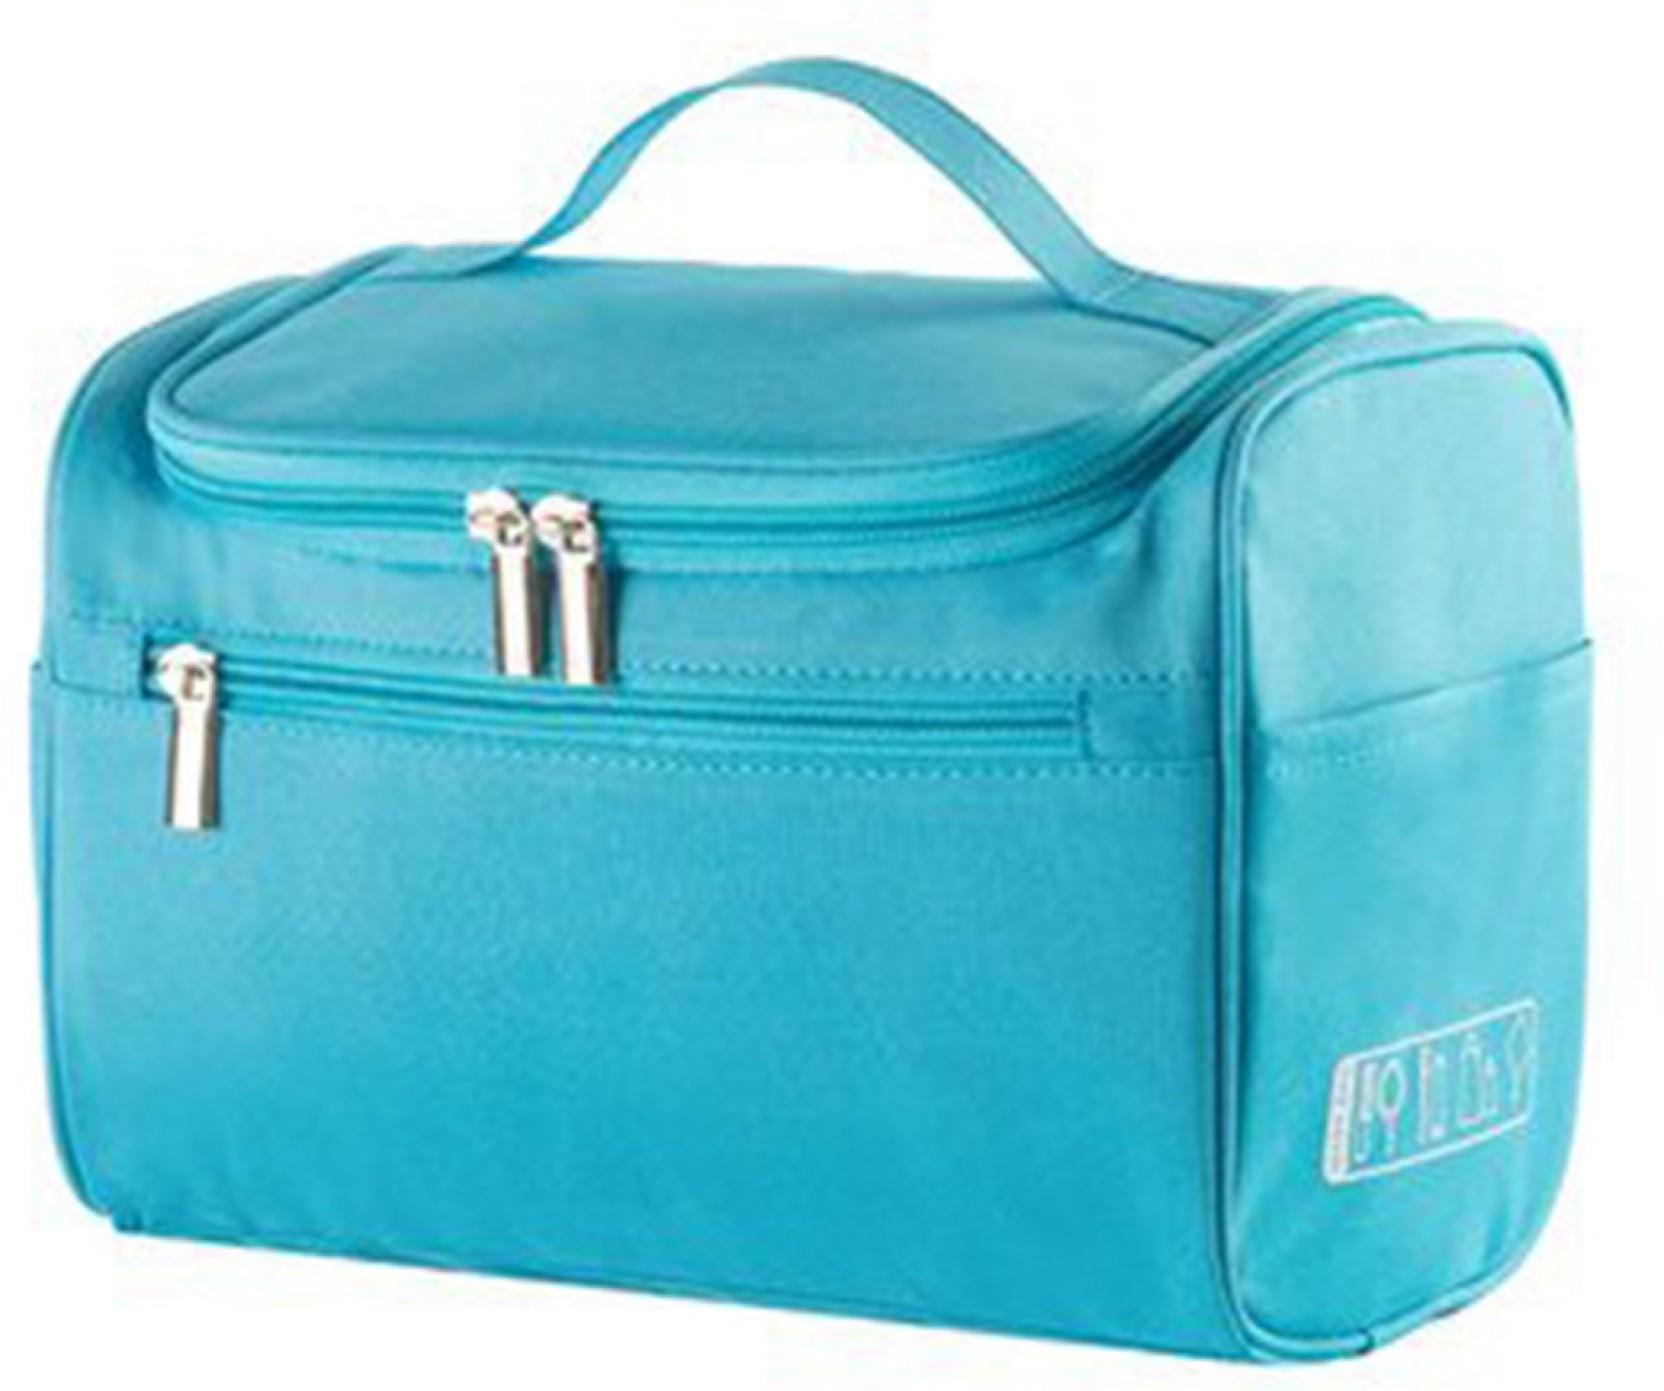 Insasta Travel Cosmetic Makeup Toiletry Case Wash Organizer Storage Pouch  Toiletry Bag Travel Organizer Toiletry Kit Travel Bag Travel Toiletry Bag  ... 1508ff38adb6c